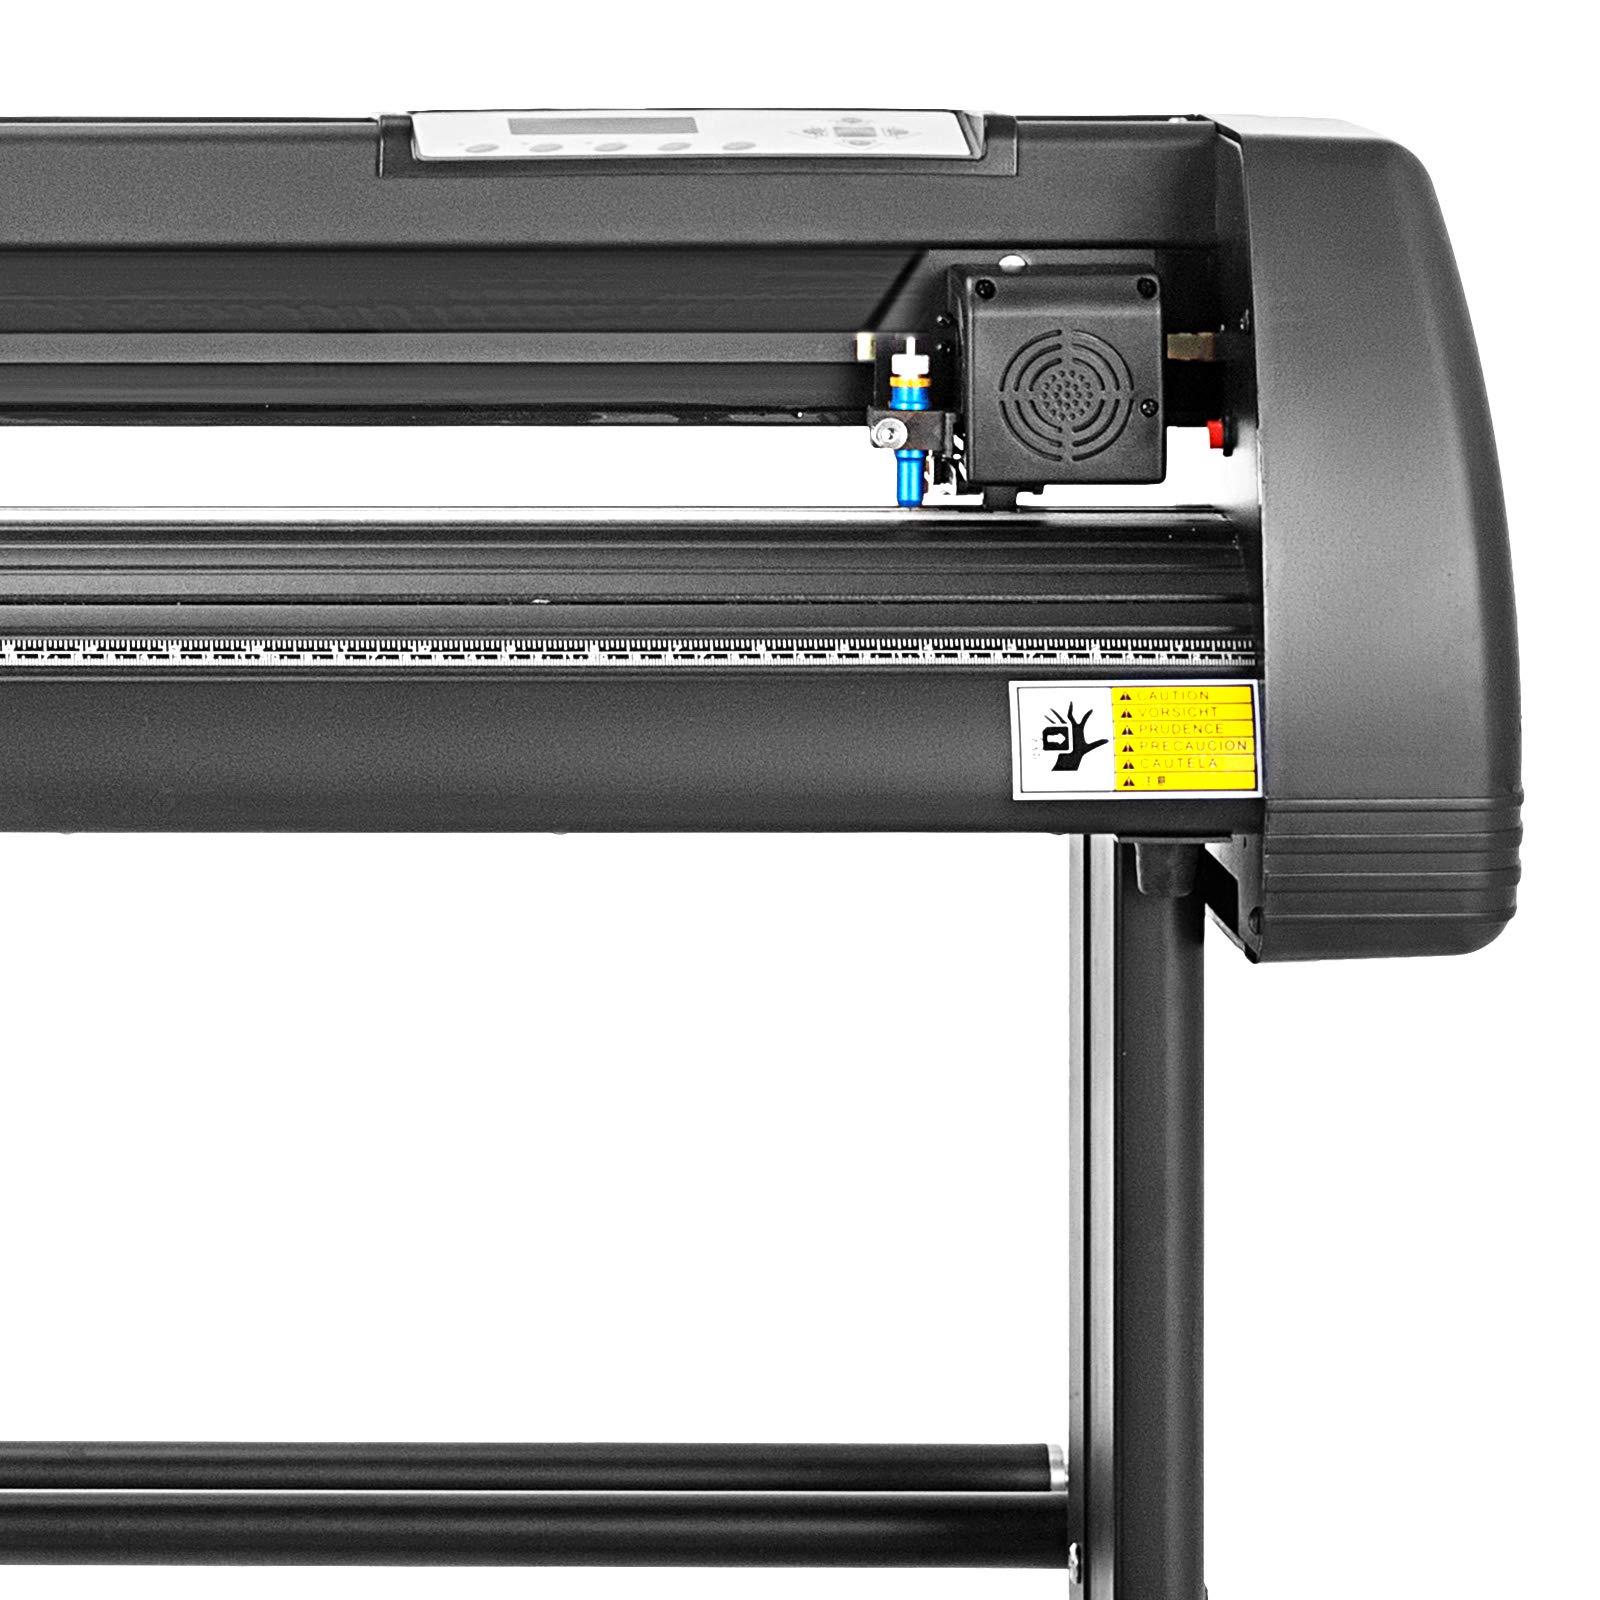 Mophorn Vinyl Cutter 28 Inch Vinyl Cutter Machine 720mm Vinyl Printer Cutter Machine LCD Display Vinyl Plotter Cutter Machine Signmaster Software Sign Making Machine with Stand by Mophorn (Image #5)